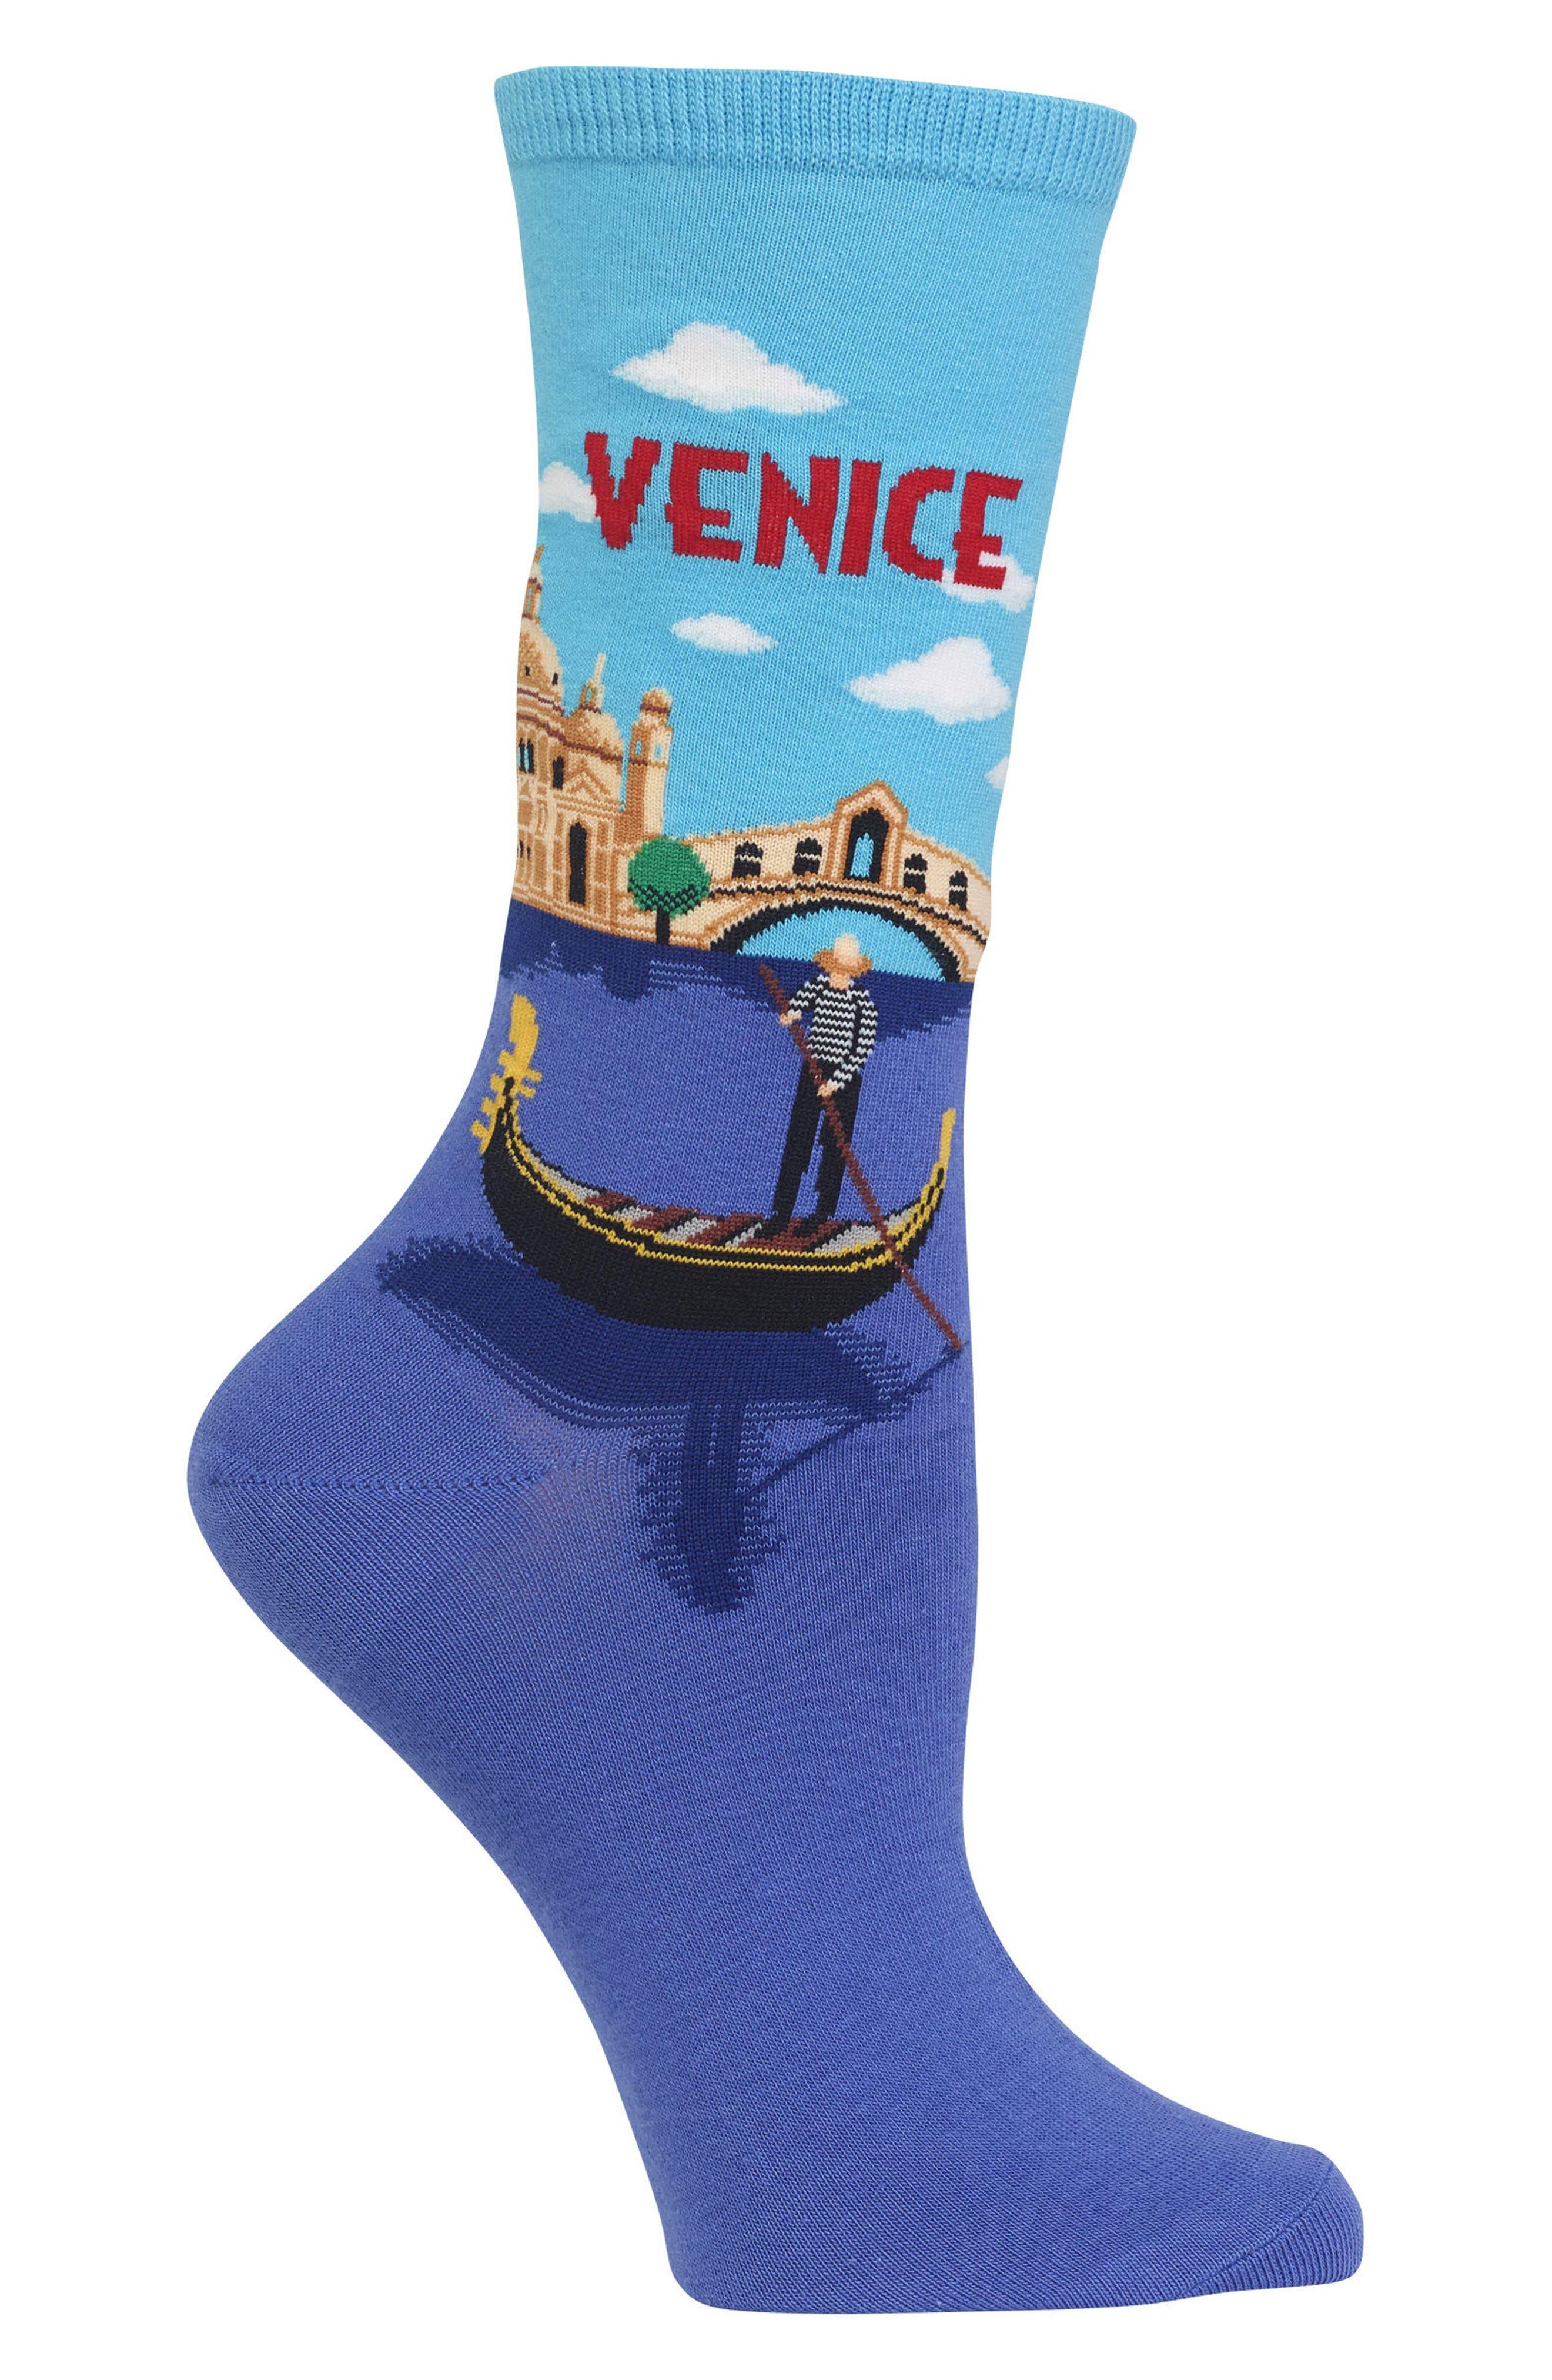 Travel Series - Venice Crew Socks,                             Alternate thumbnail 2, color,                             468